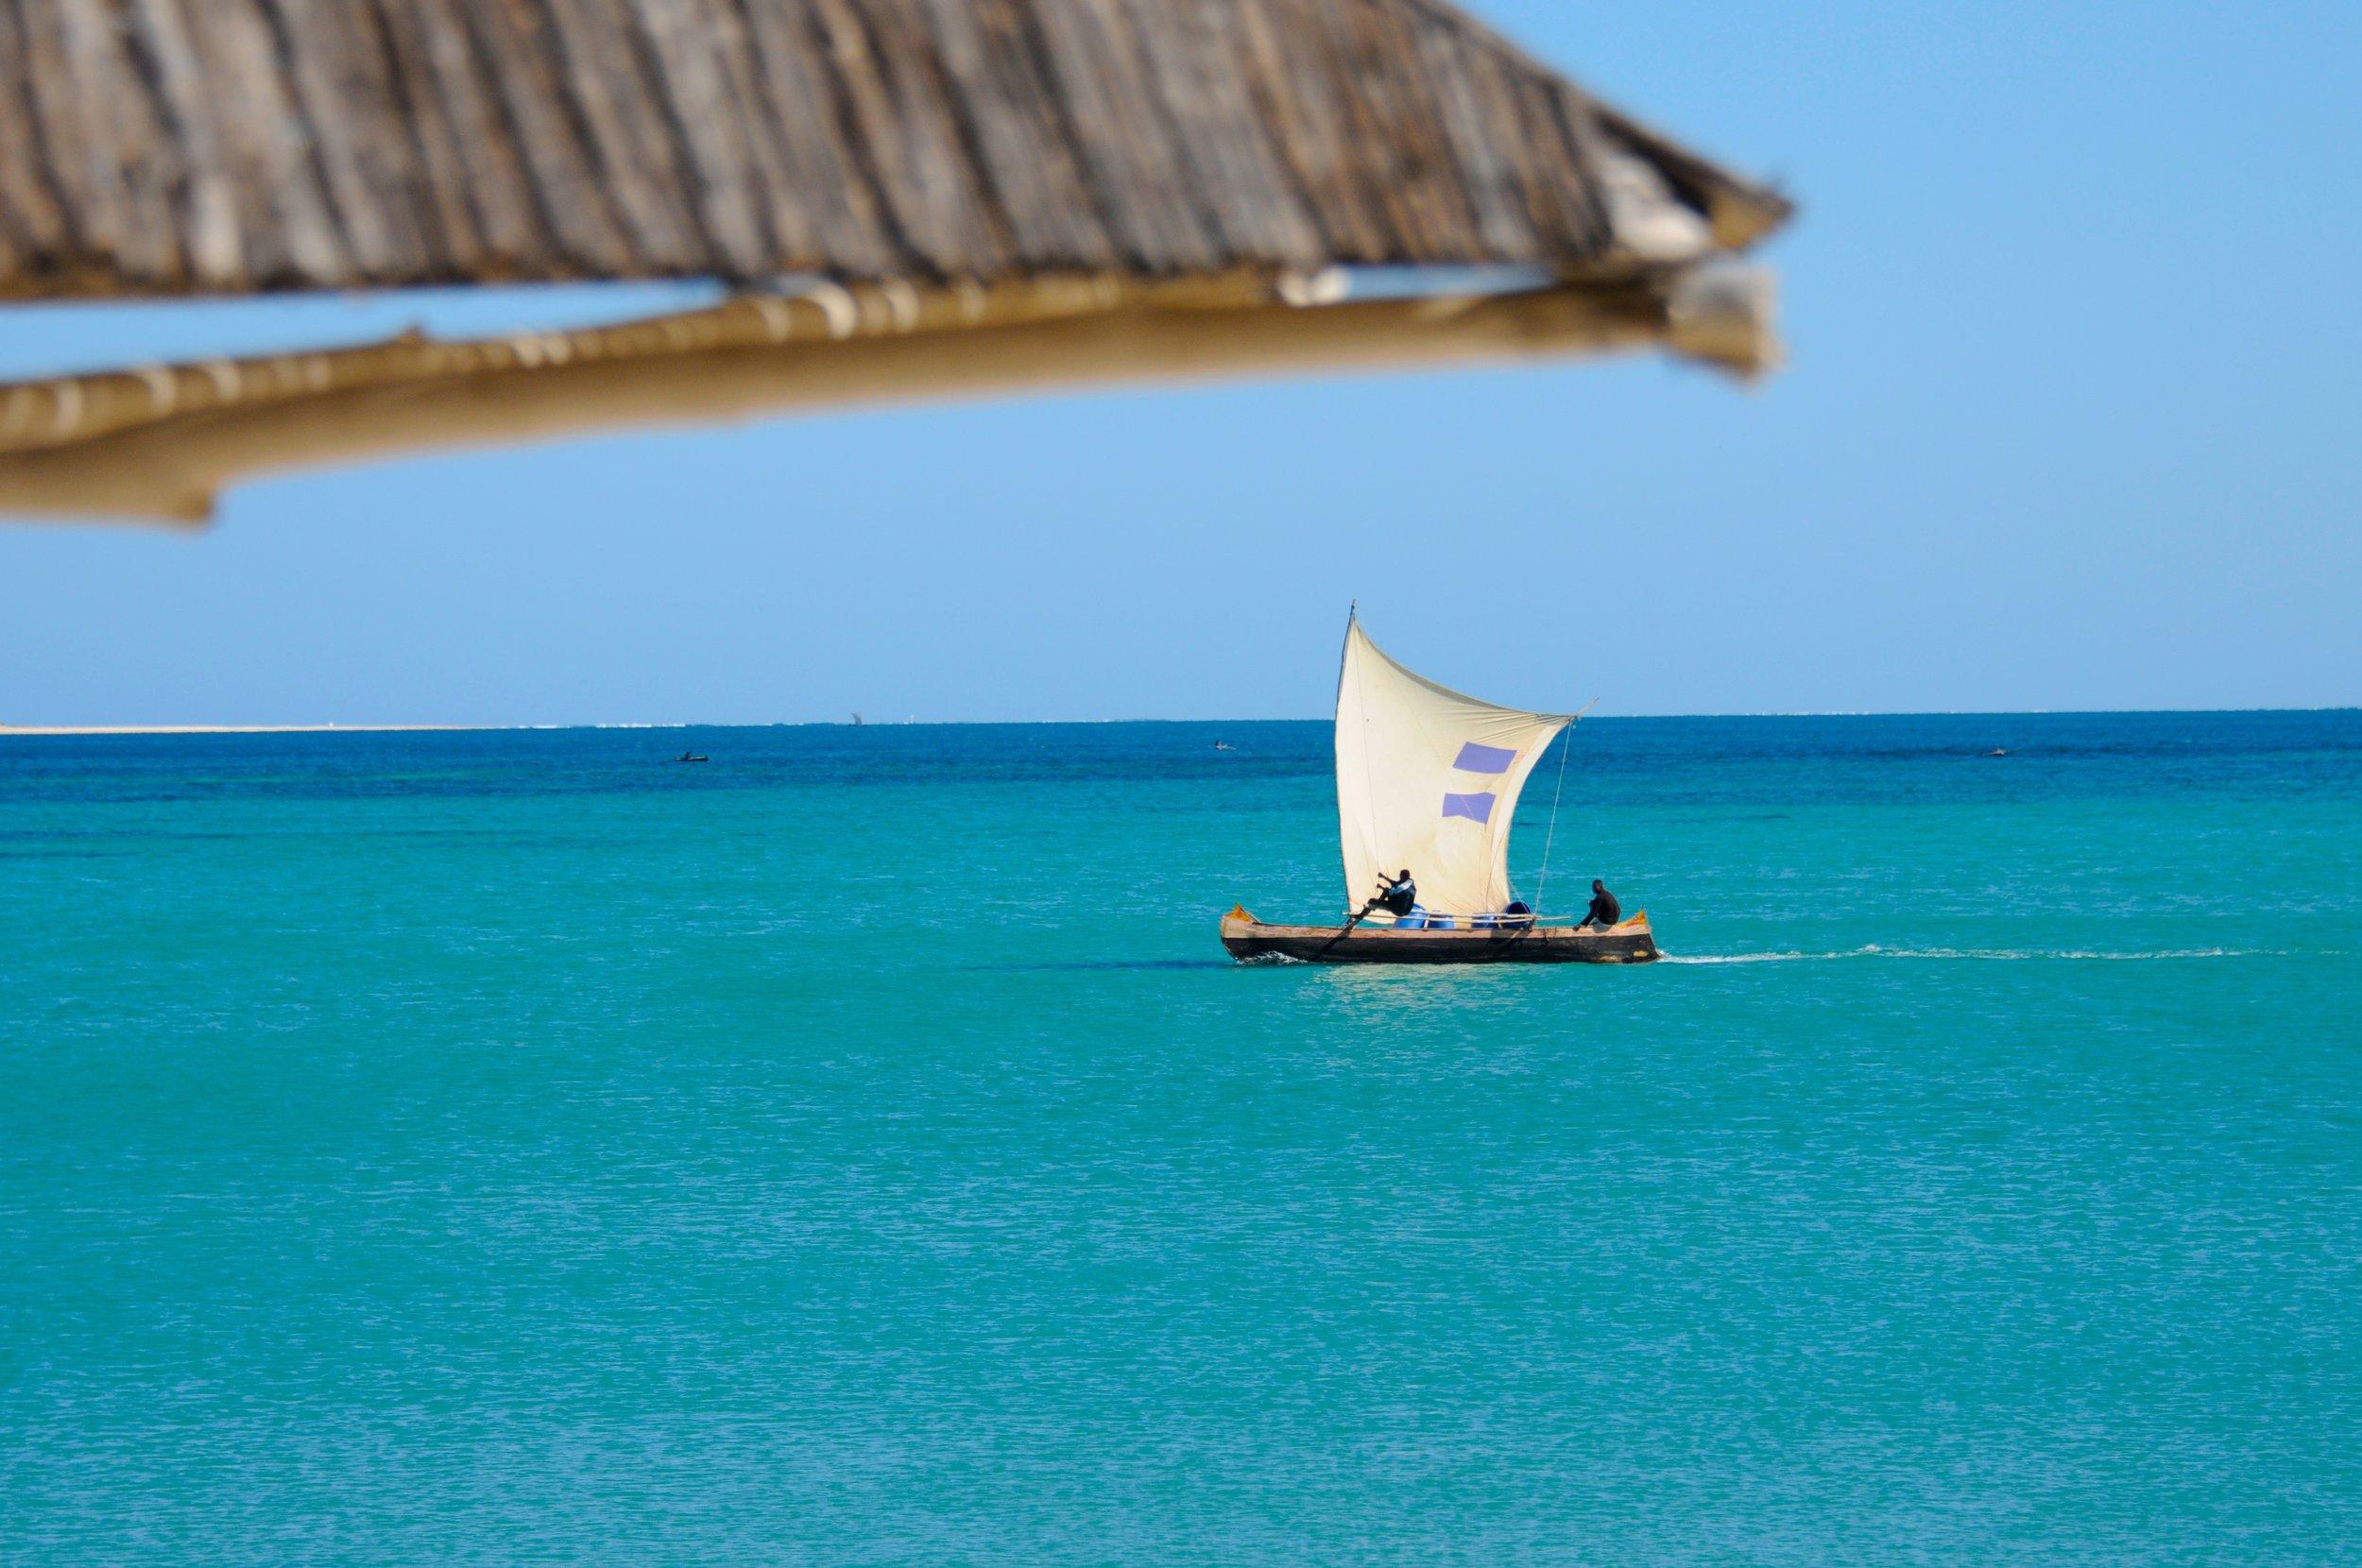 Copy of OMX August Madagascar Surf camp trip